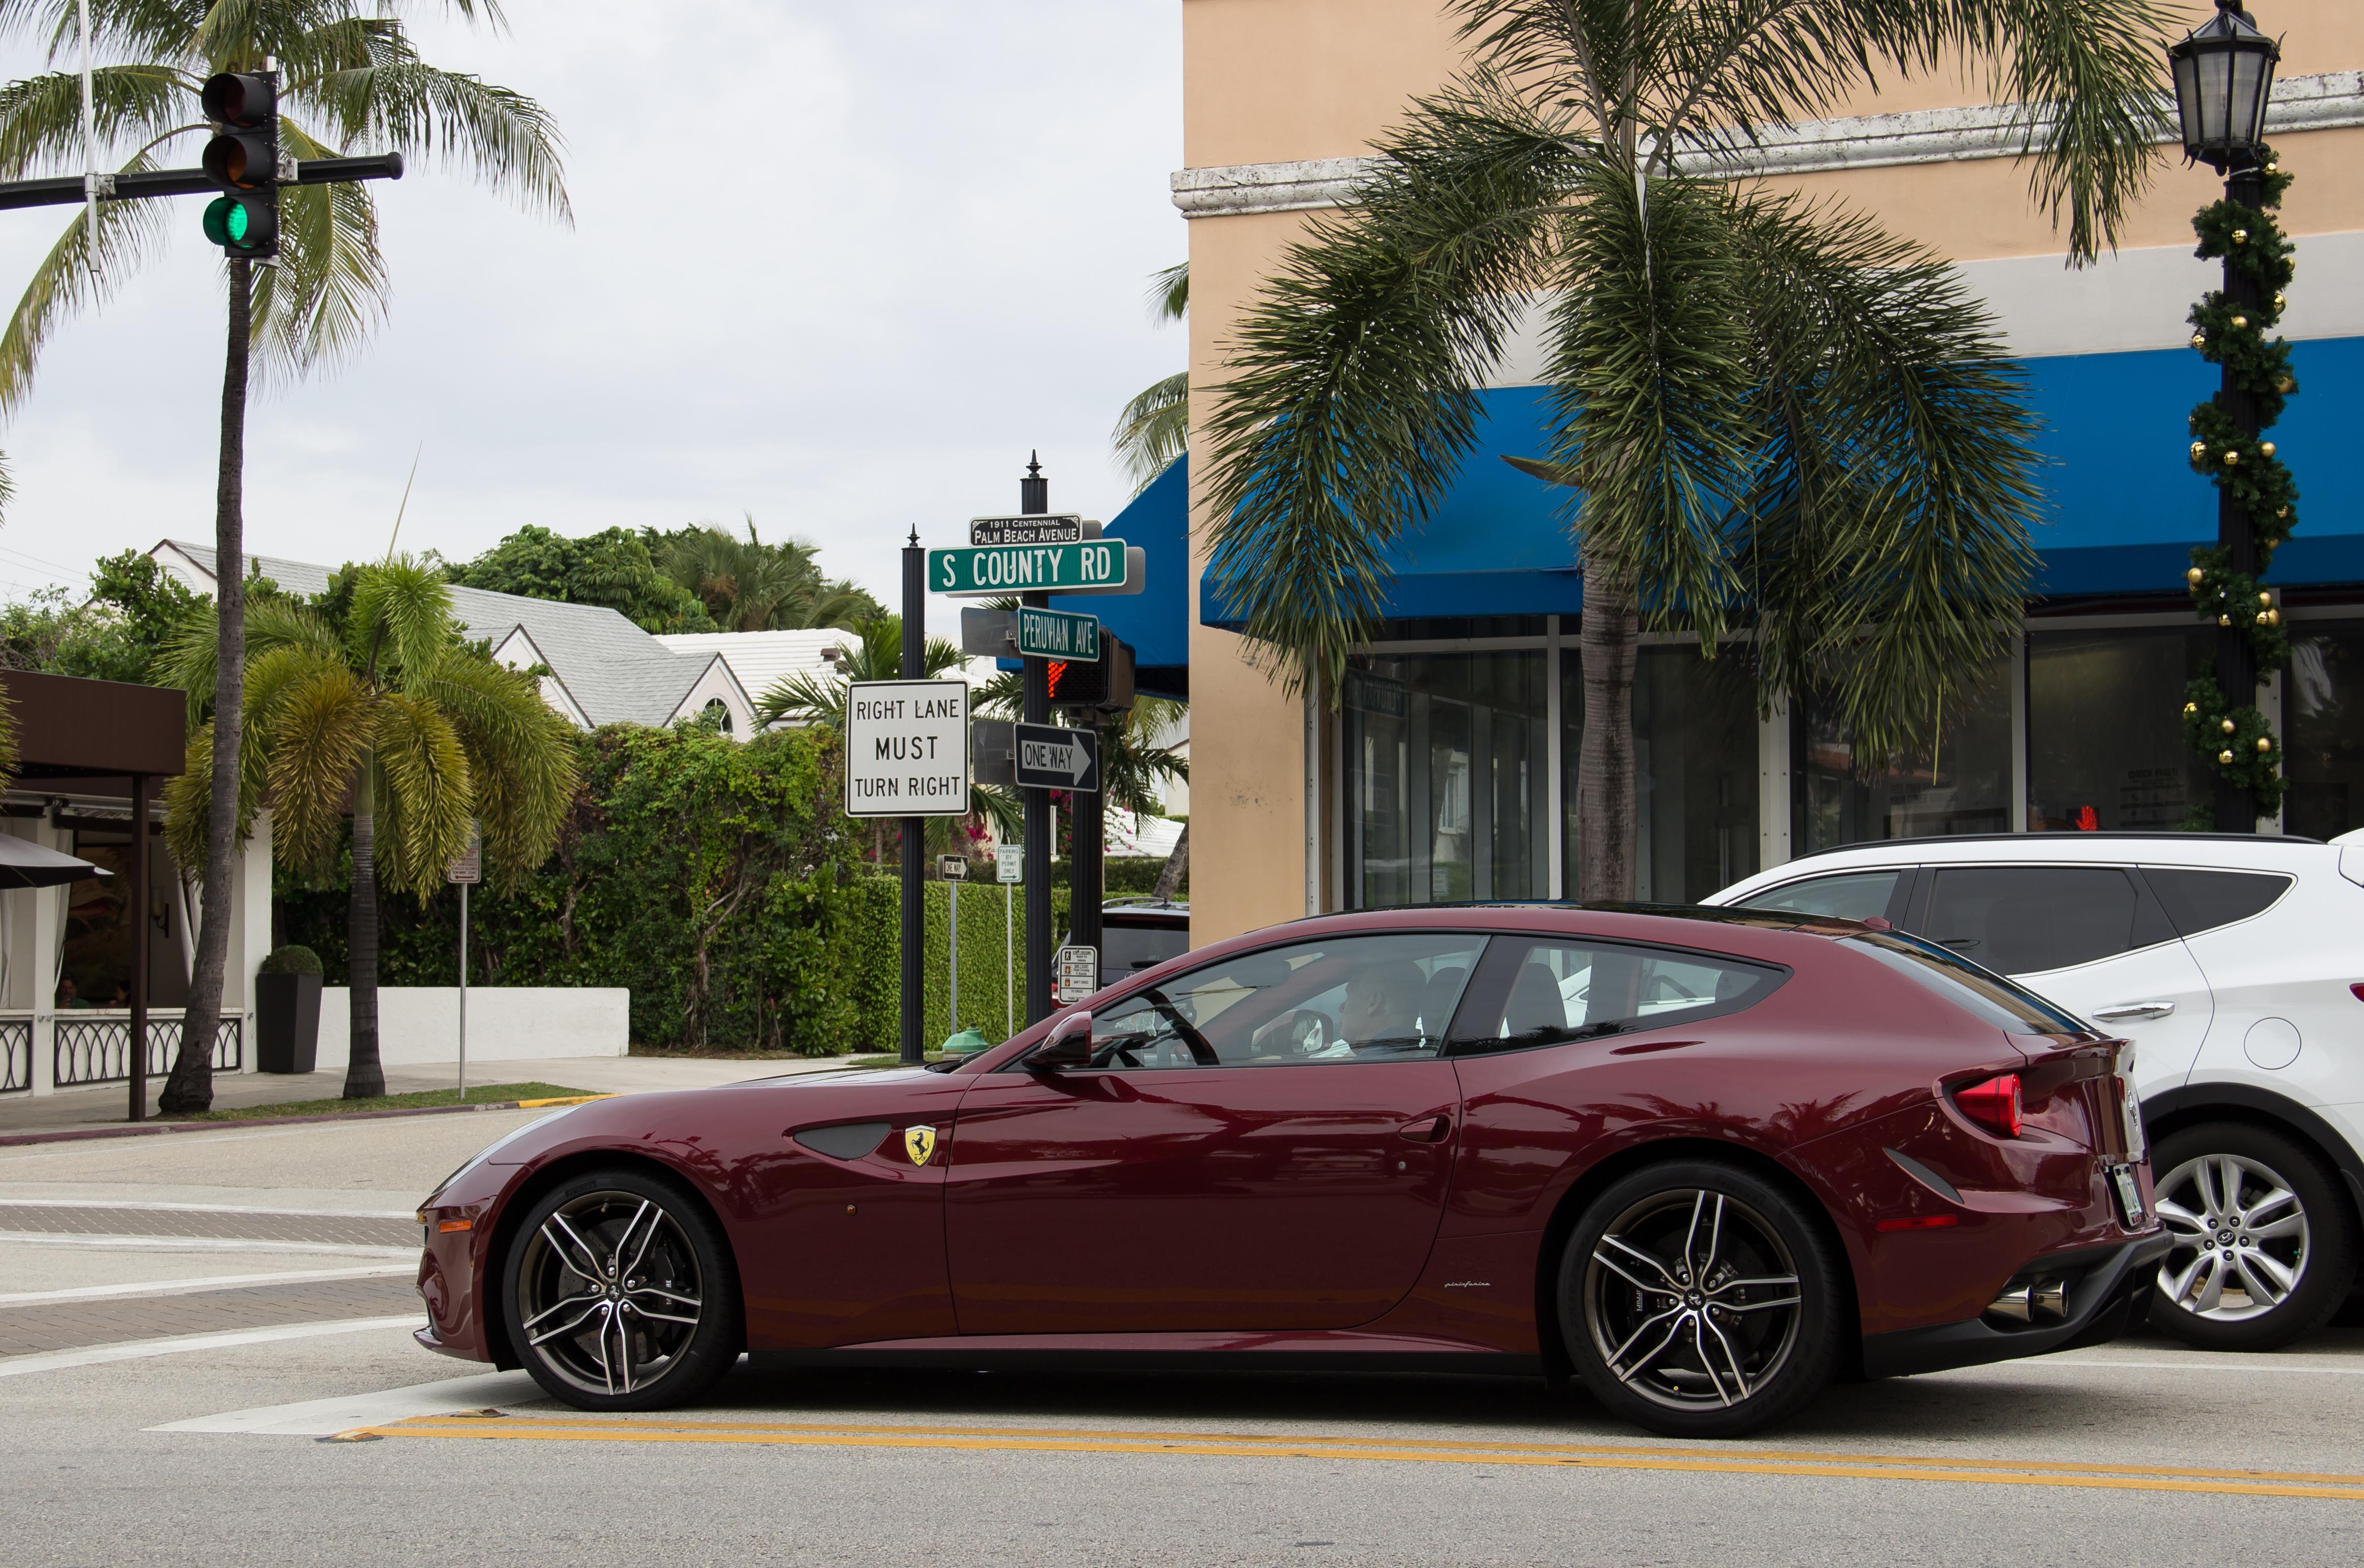 Baggrunde : biler, Ford, strand, bil, mercedes, Benz, martin, Lotus, Florida, syd, Ferrari ...